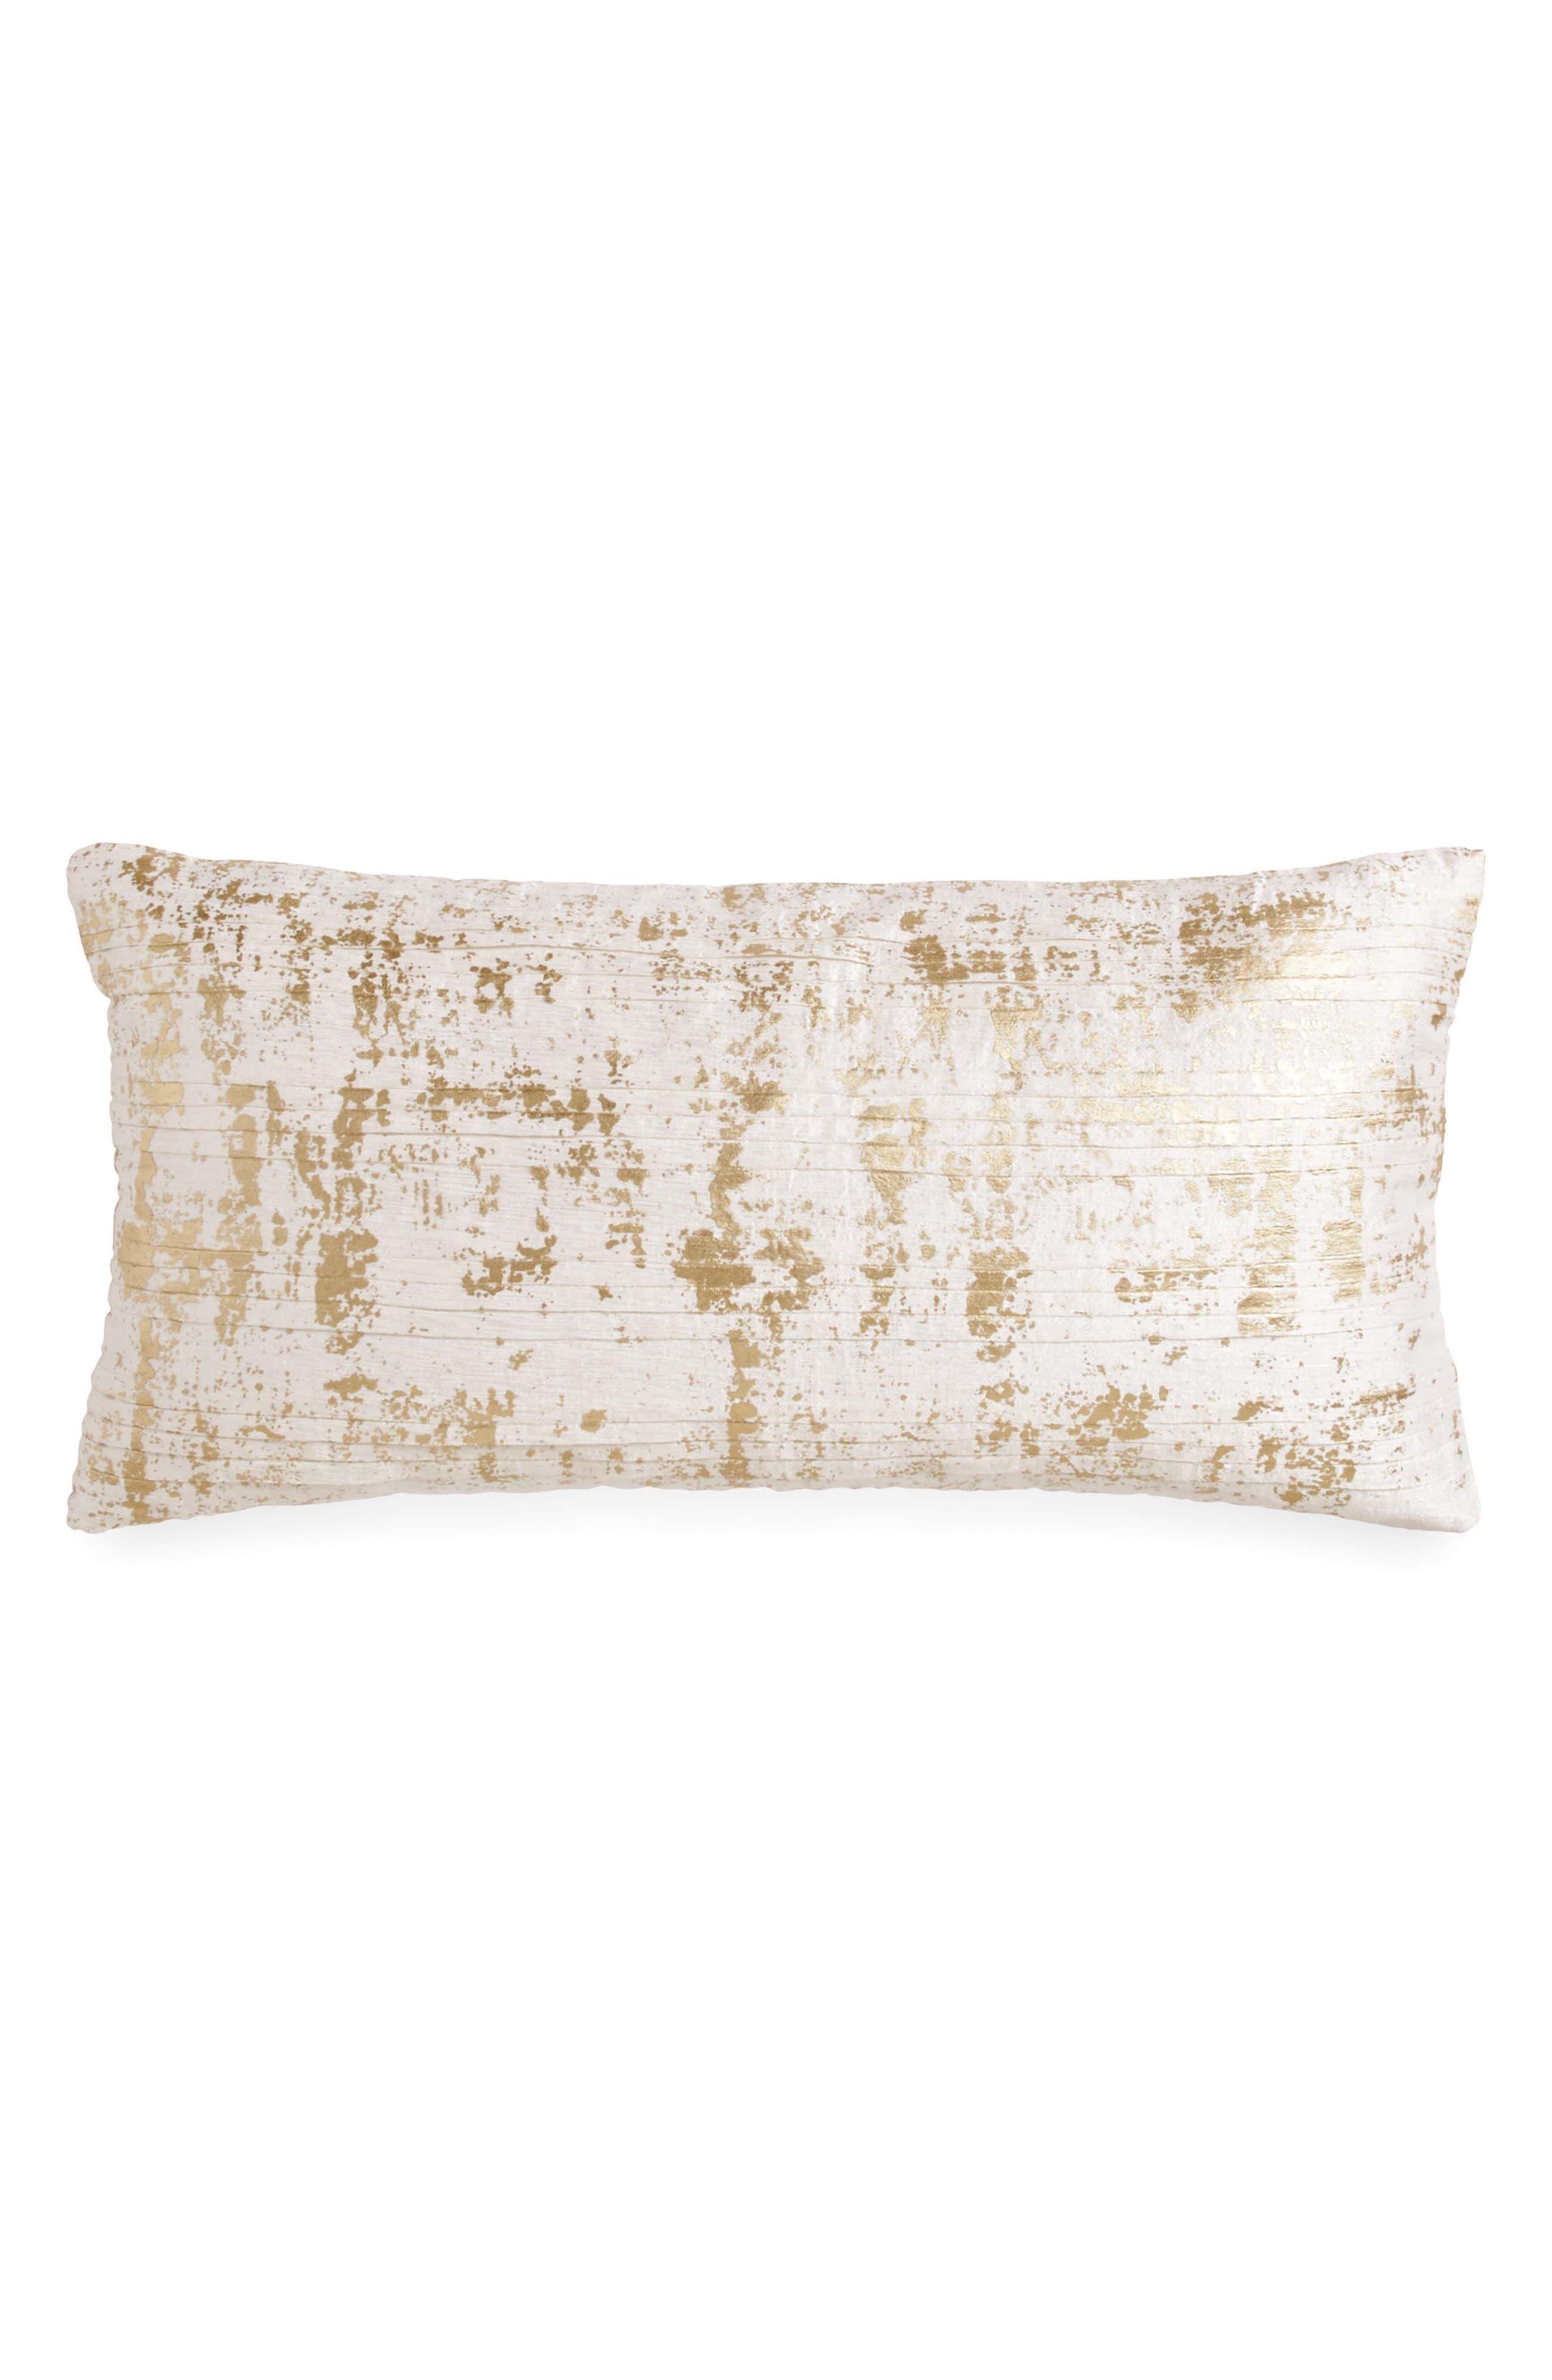 Main Image - Donna Karan New York Opal Essence Pillow